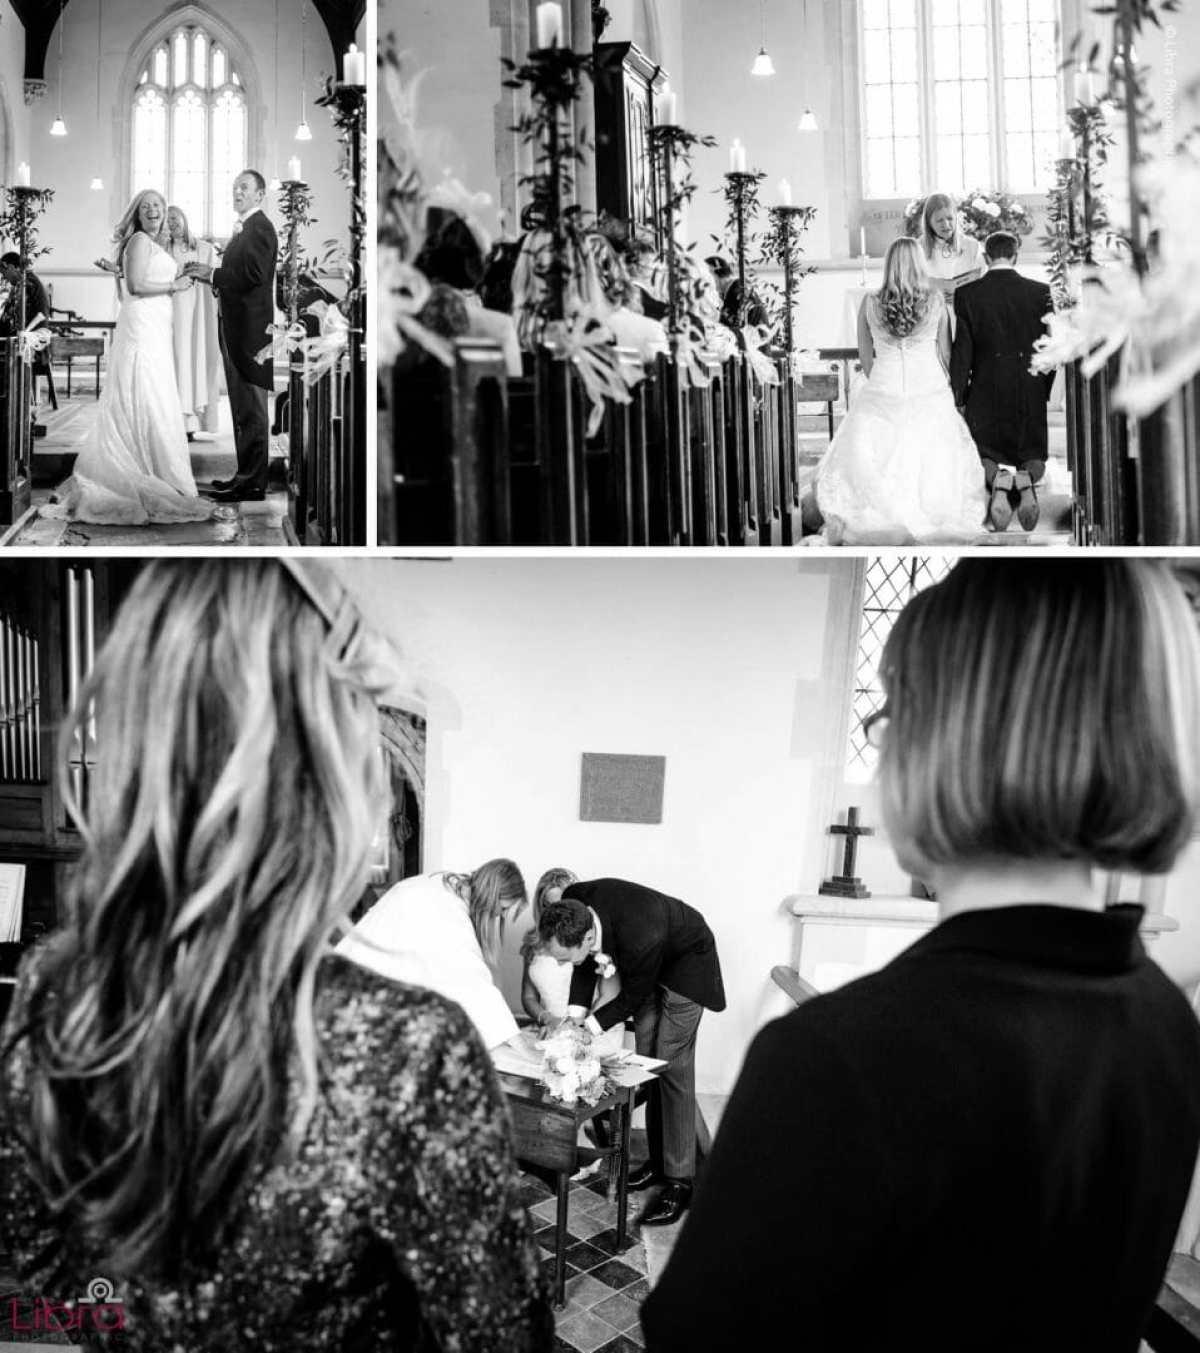 Wedding seremony in black and white